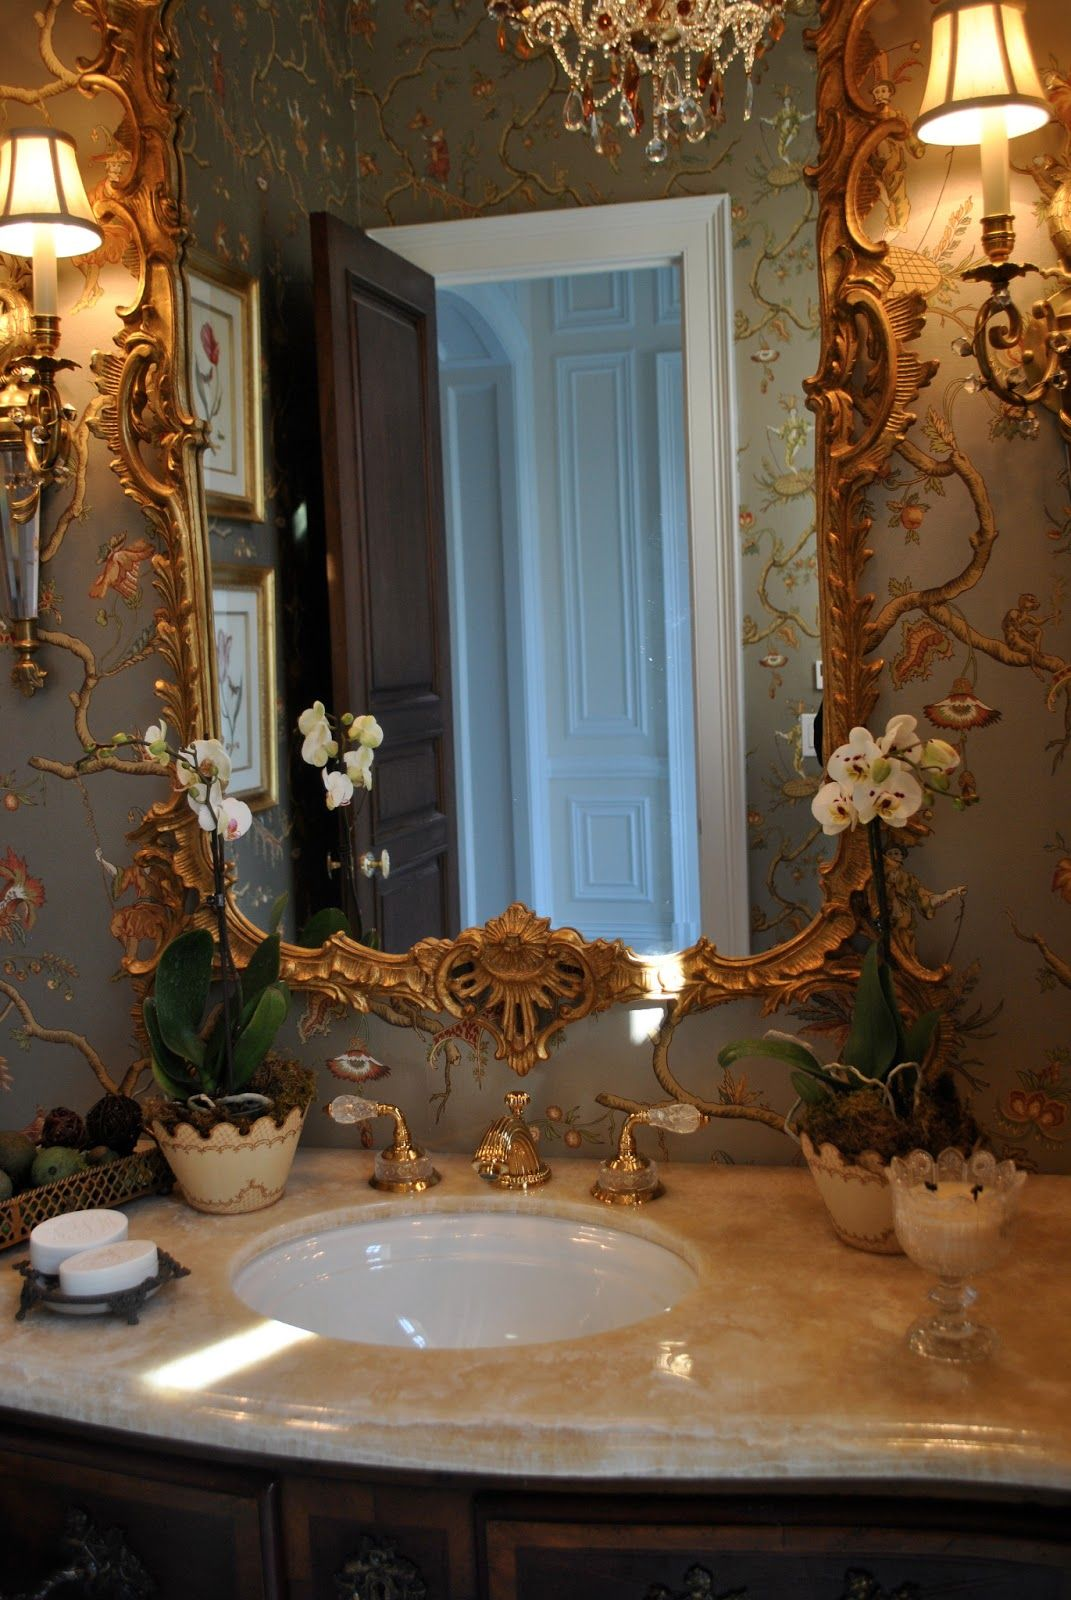 Miroir Sympa Salle De Bain ~  pingl par nina ljutic sur glam powder rooms pinterest salles